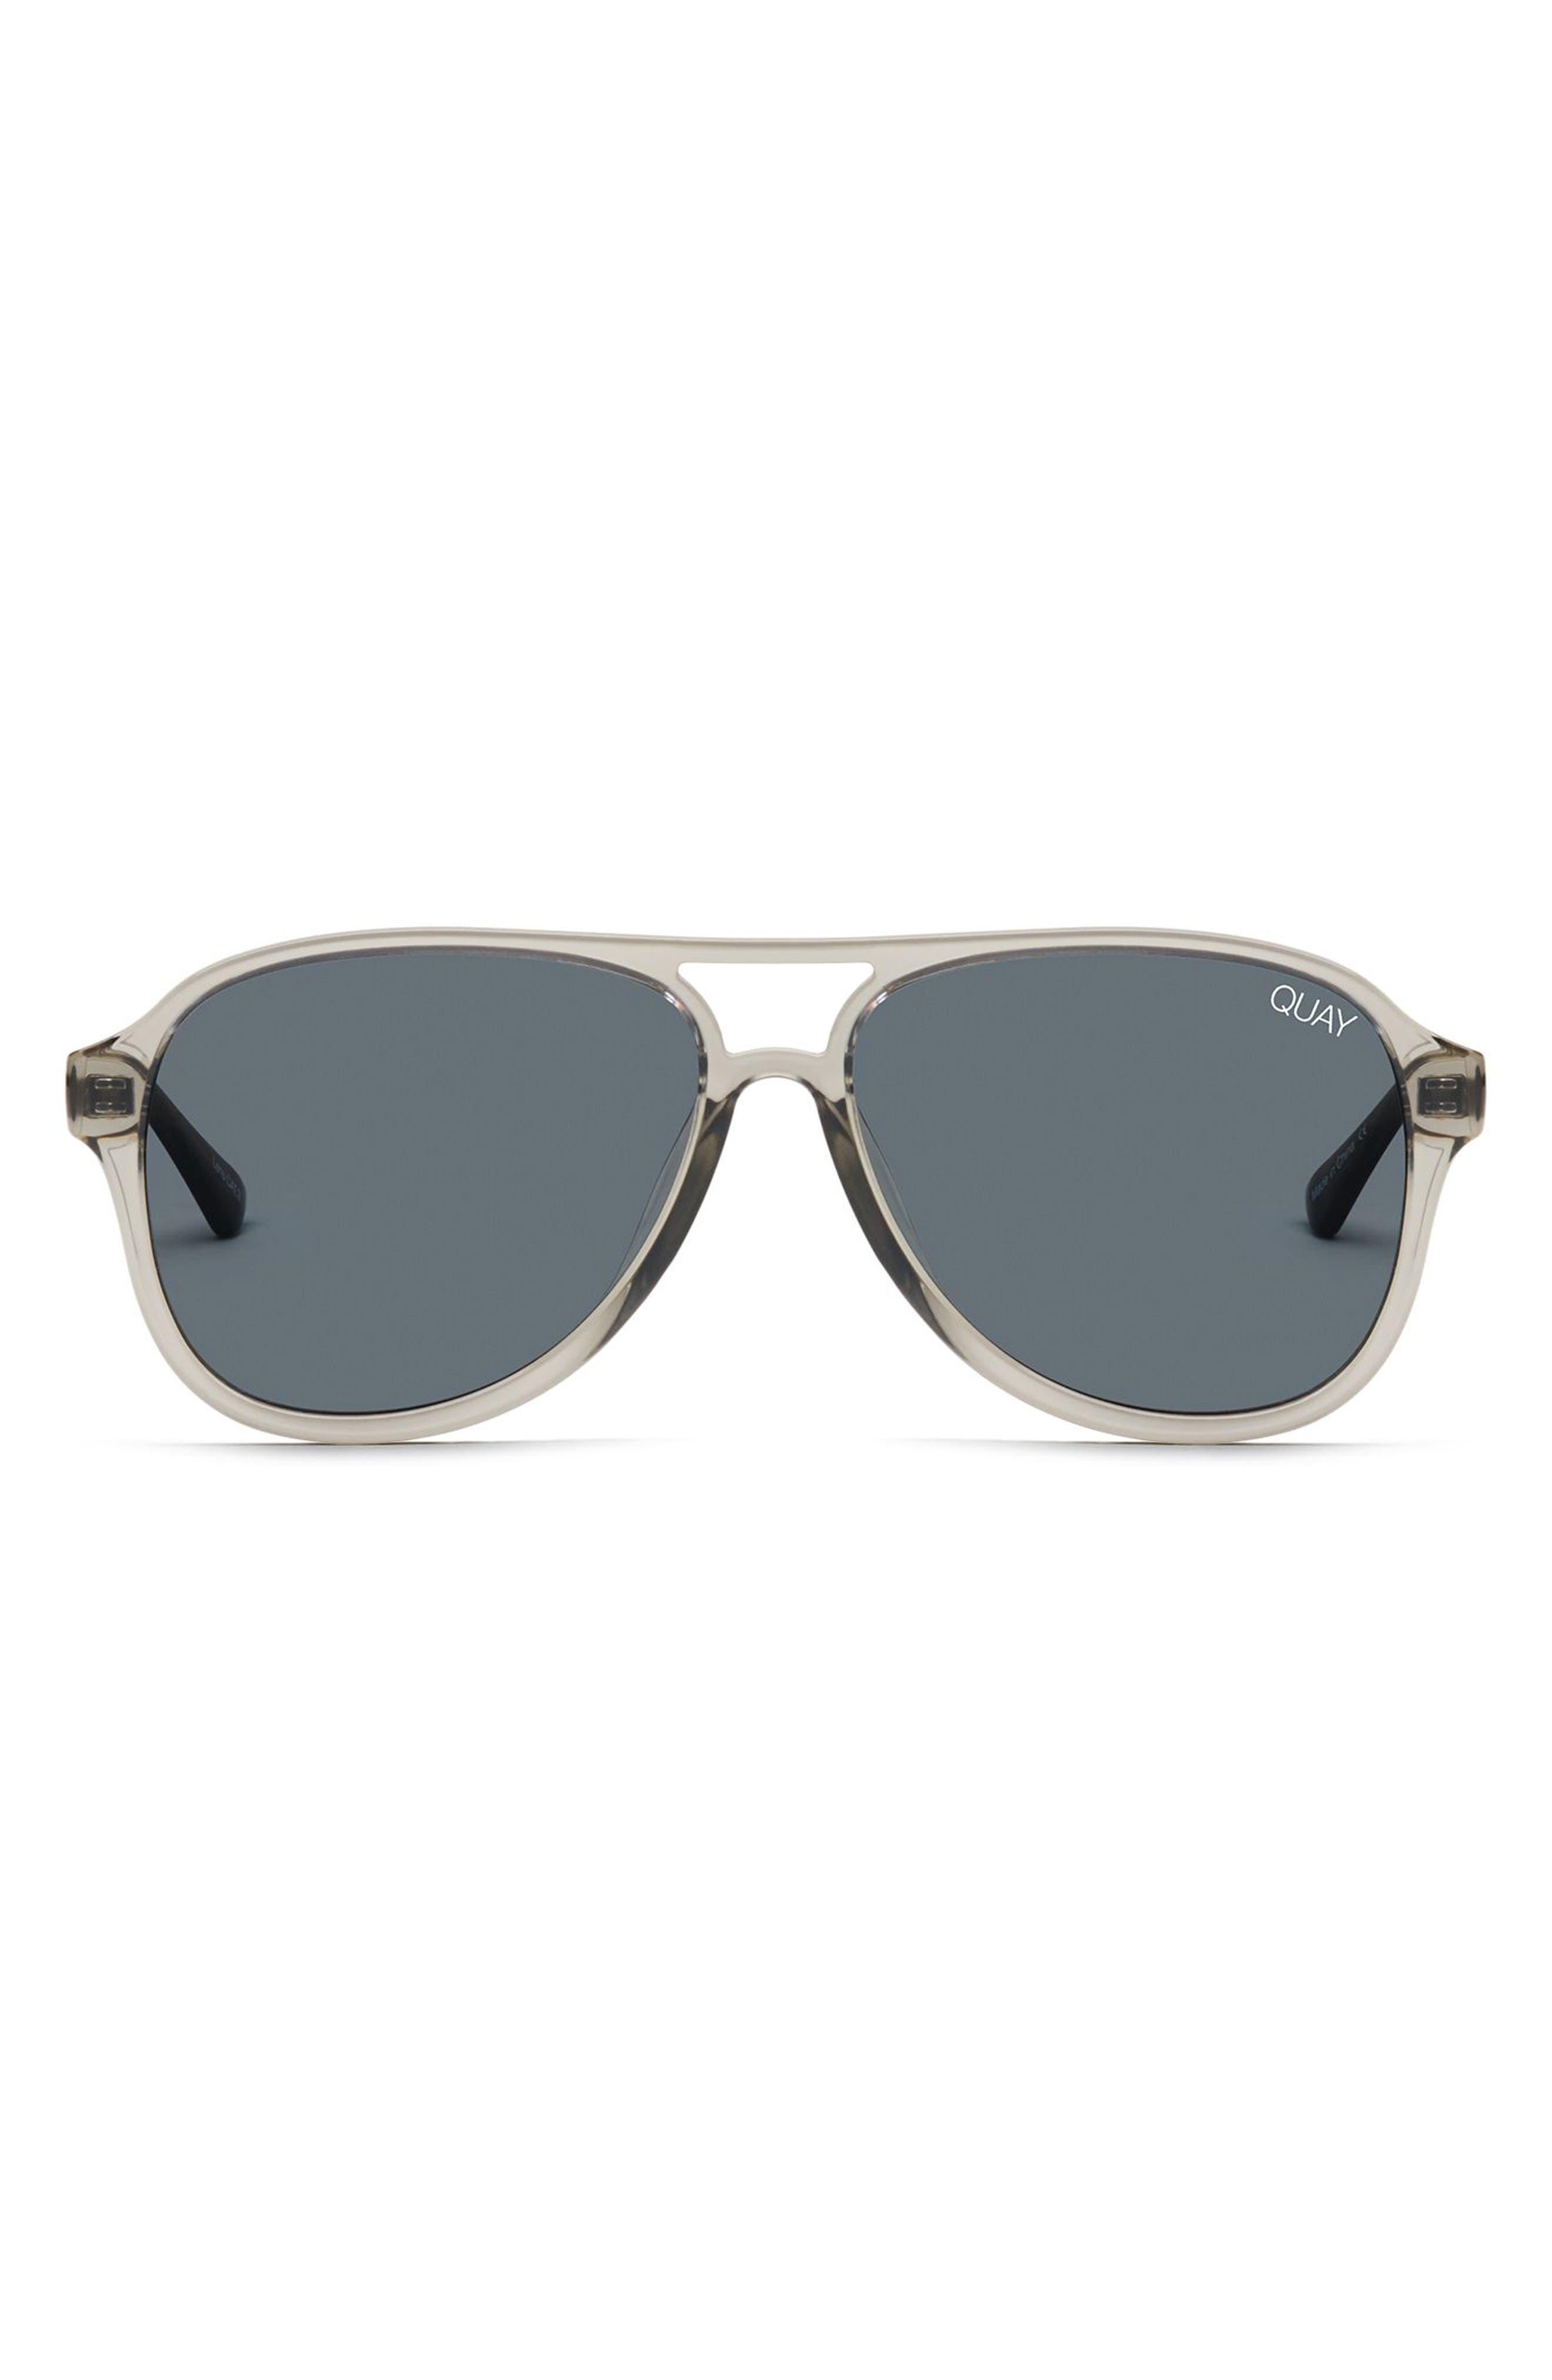 Under Pressure 58mm Aviator Sunglasses,                             Alternate thumbnail 5, color,                             GREY/ SMOKE